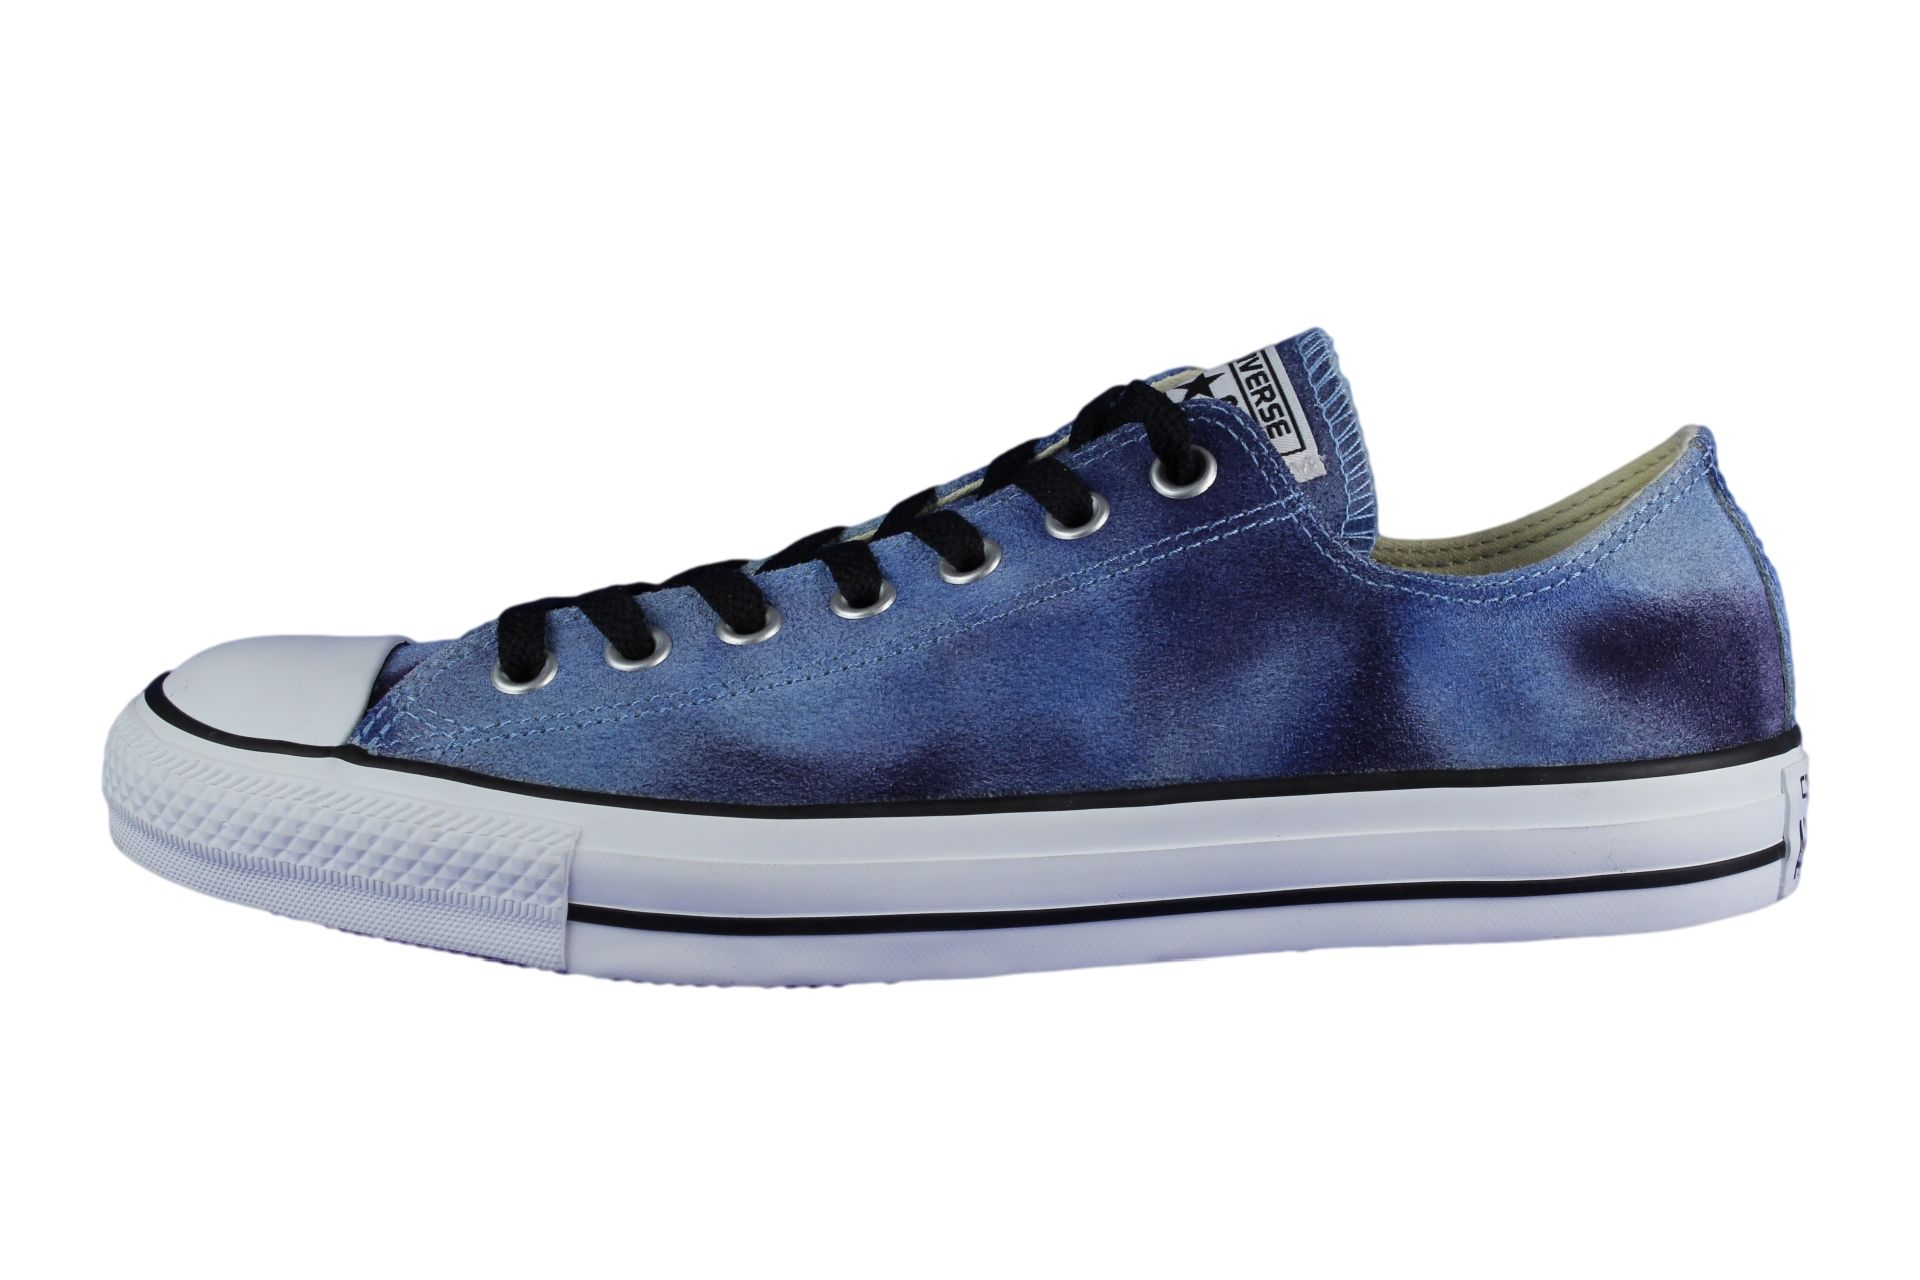 converse chucks all star ox schuhe airway blue blau gr 42. Black Bedroom Furniture Sets. Home Design Ideas